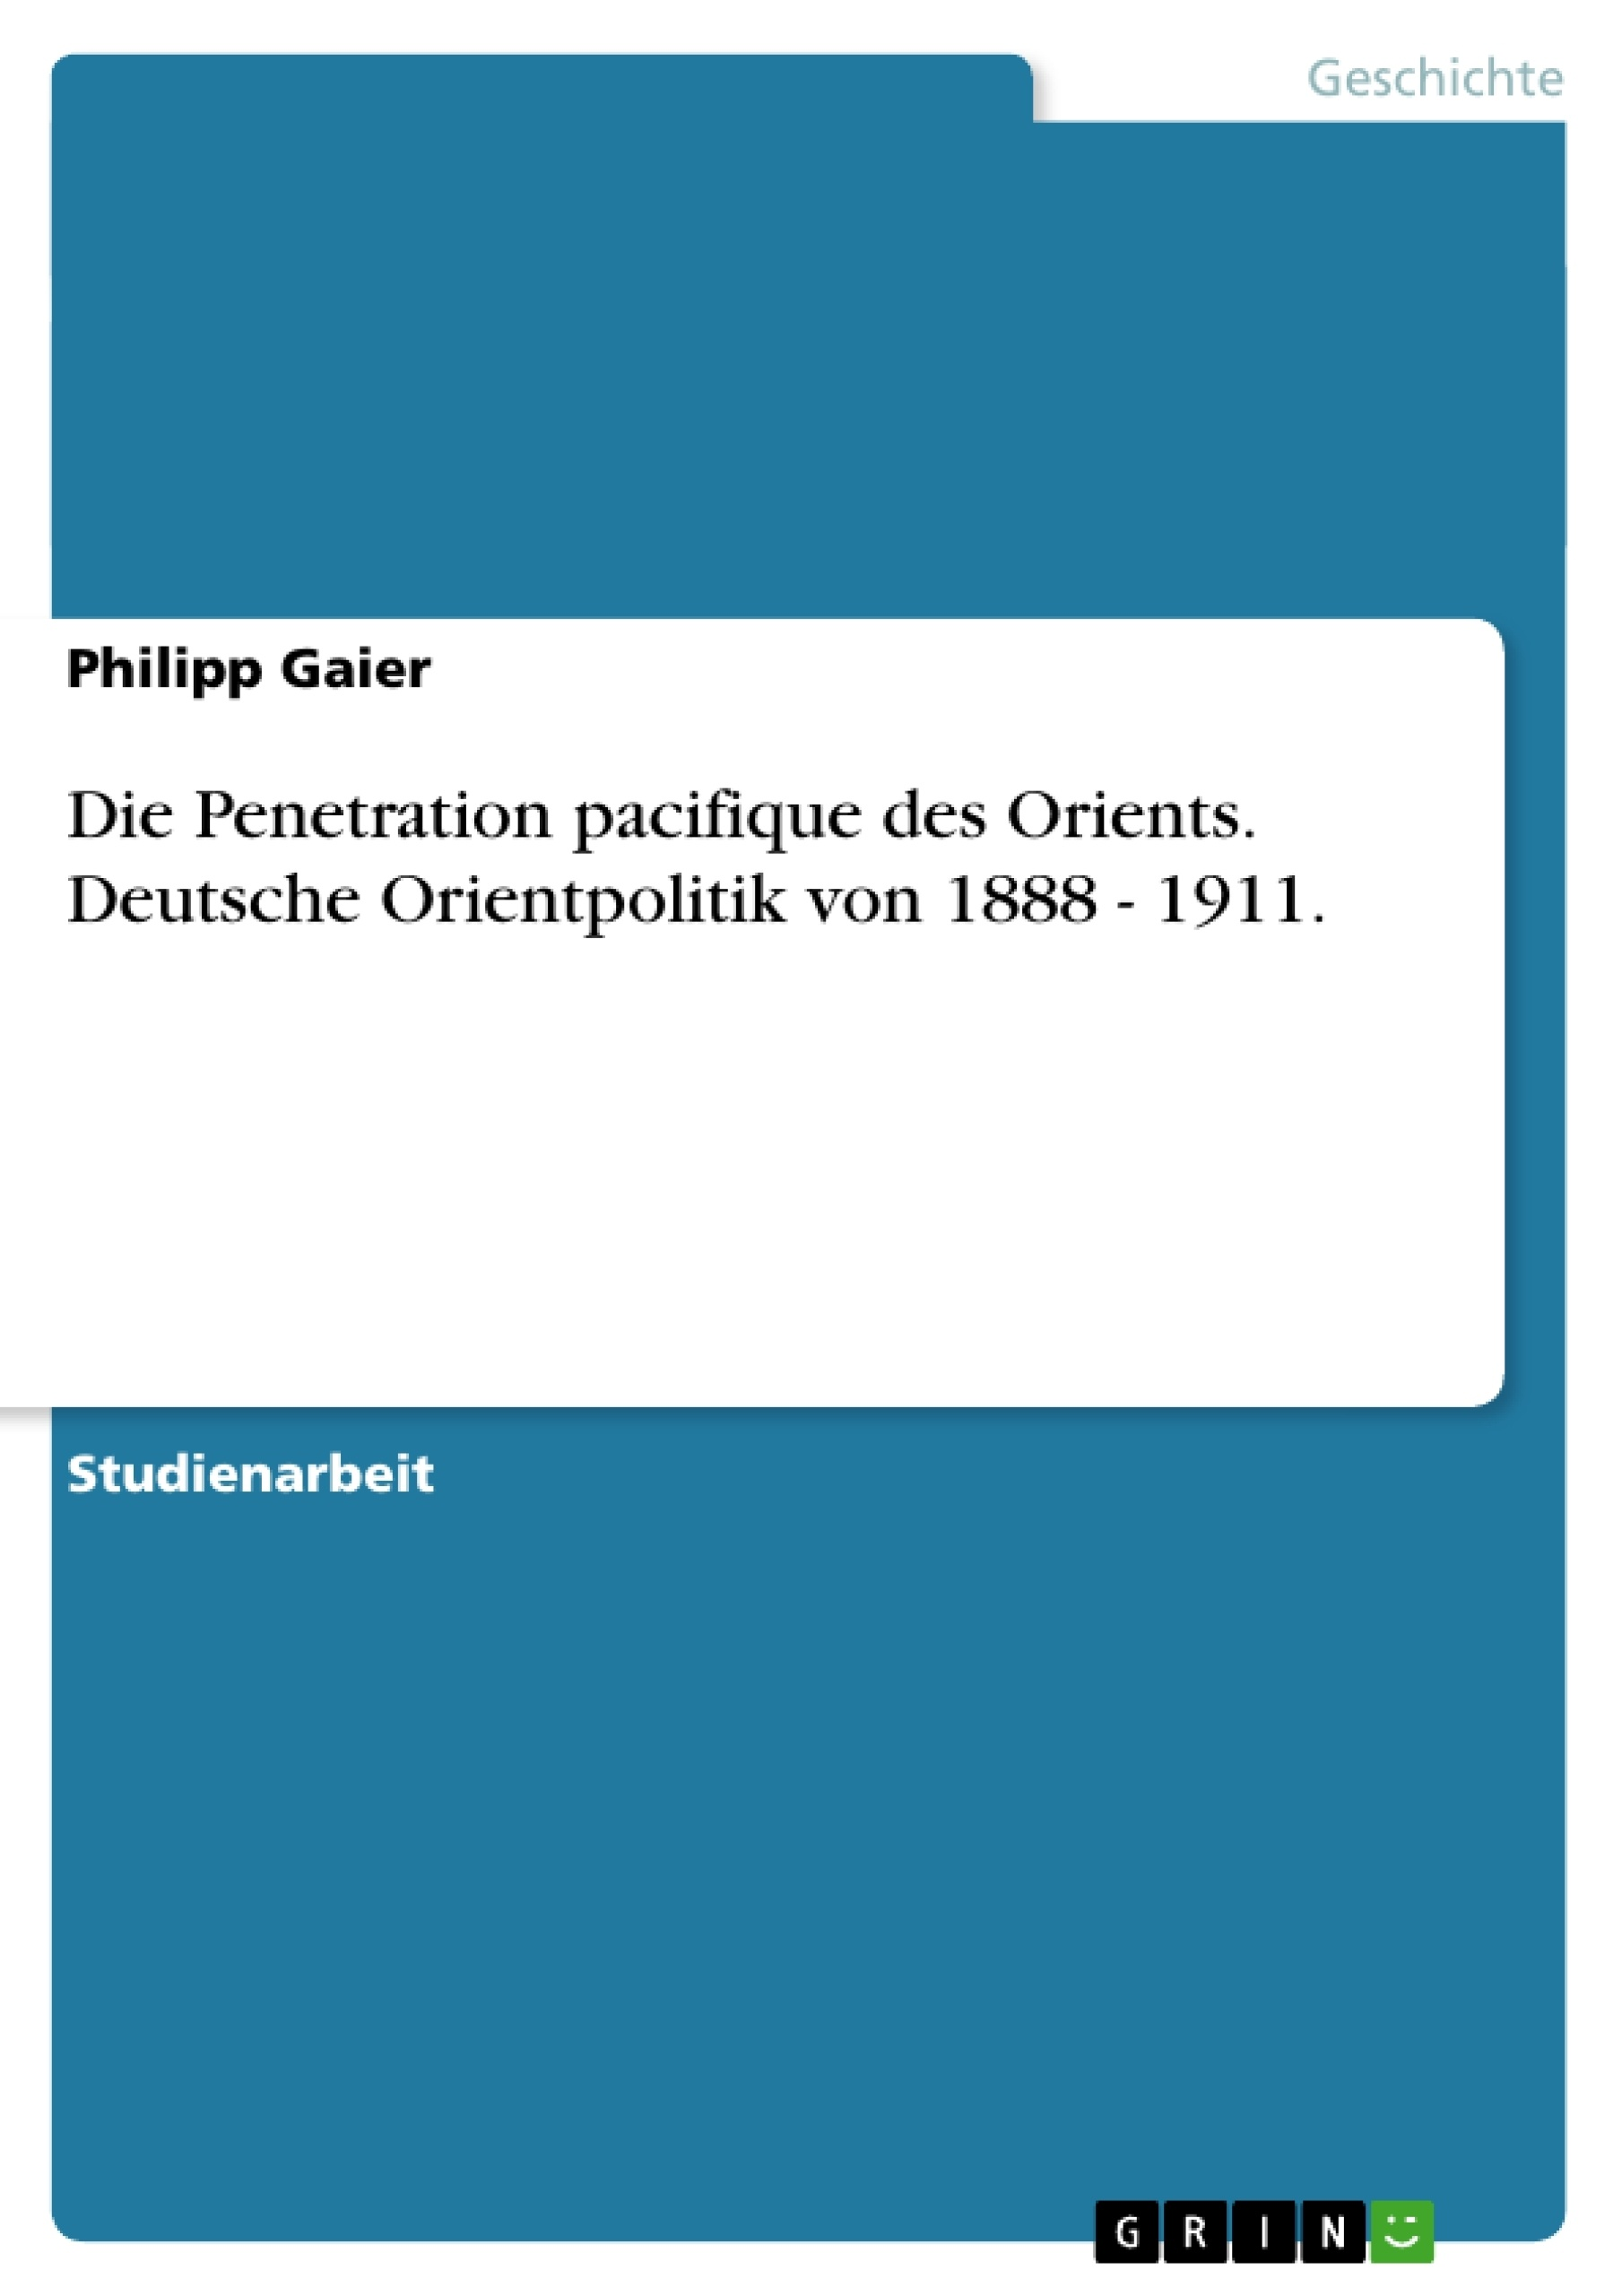 Titel: Die Penetration pacifique des Orients. Deutsche Orientpolitik von 1888 - 1911.